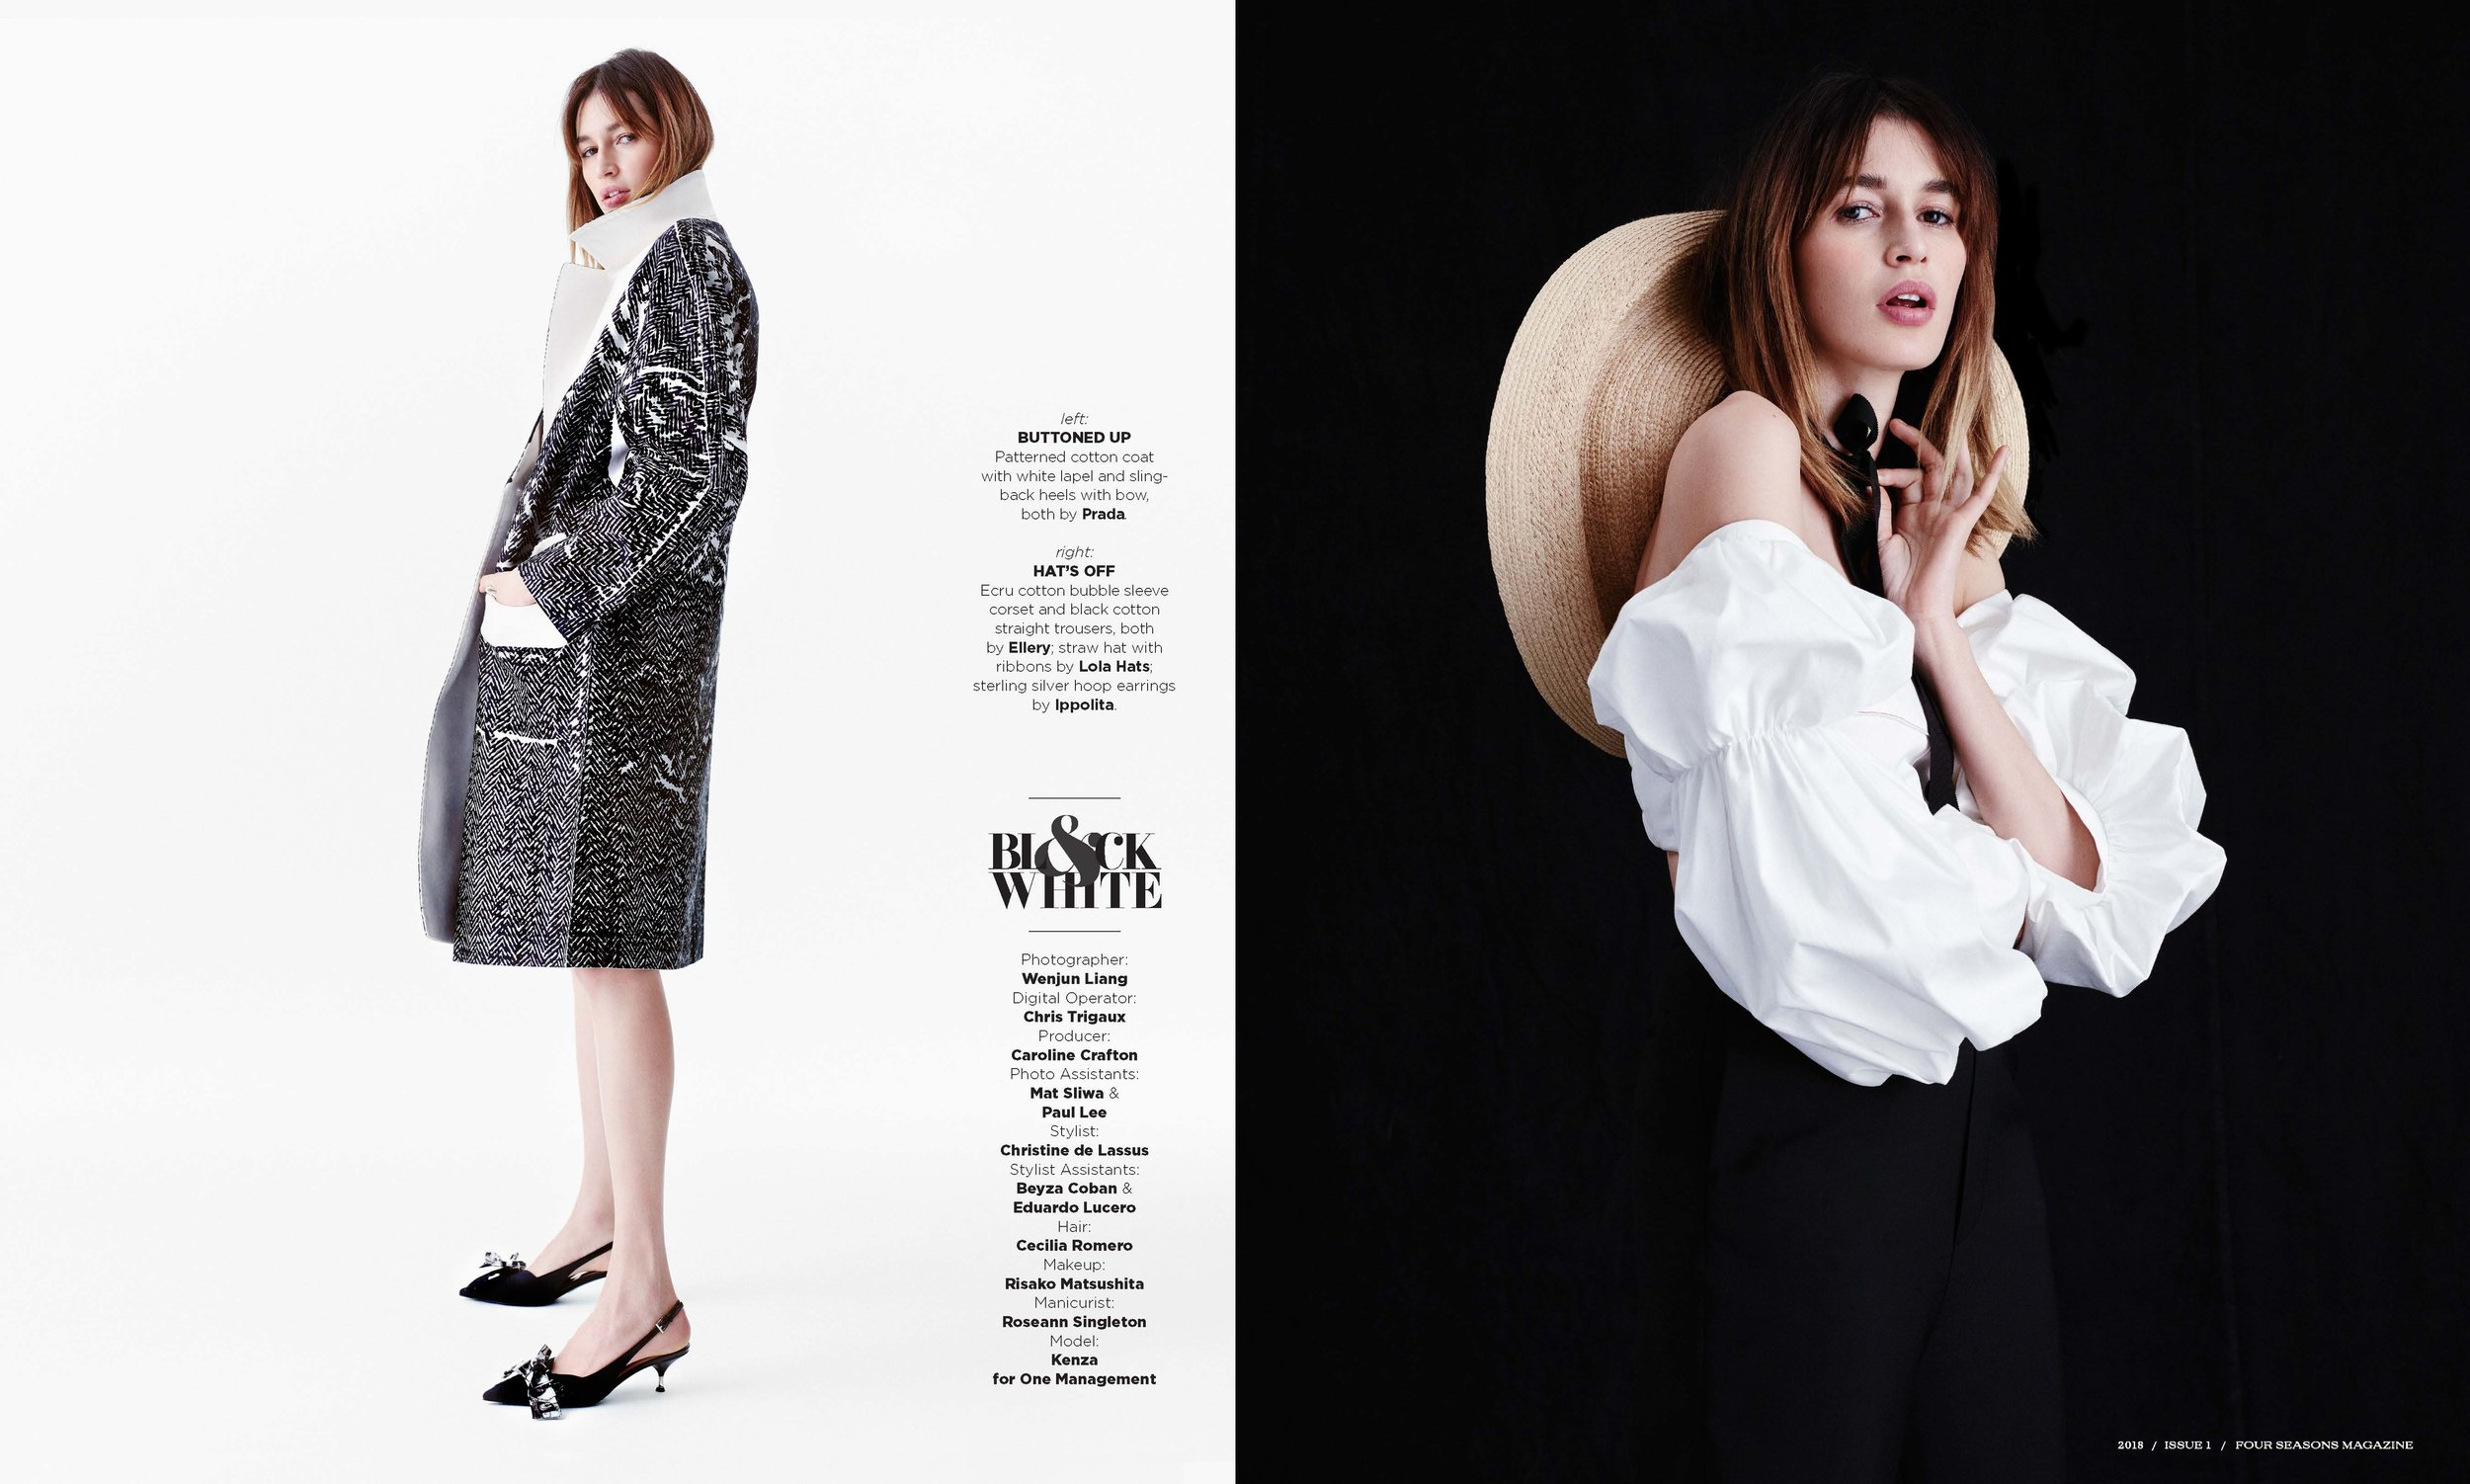 Photo, Wenjun Liang; Styling, Christine de Lassus; Hair, Cecilia Romero; MUA, Risako Matsushita; Manicurist, Roseann Singleton